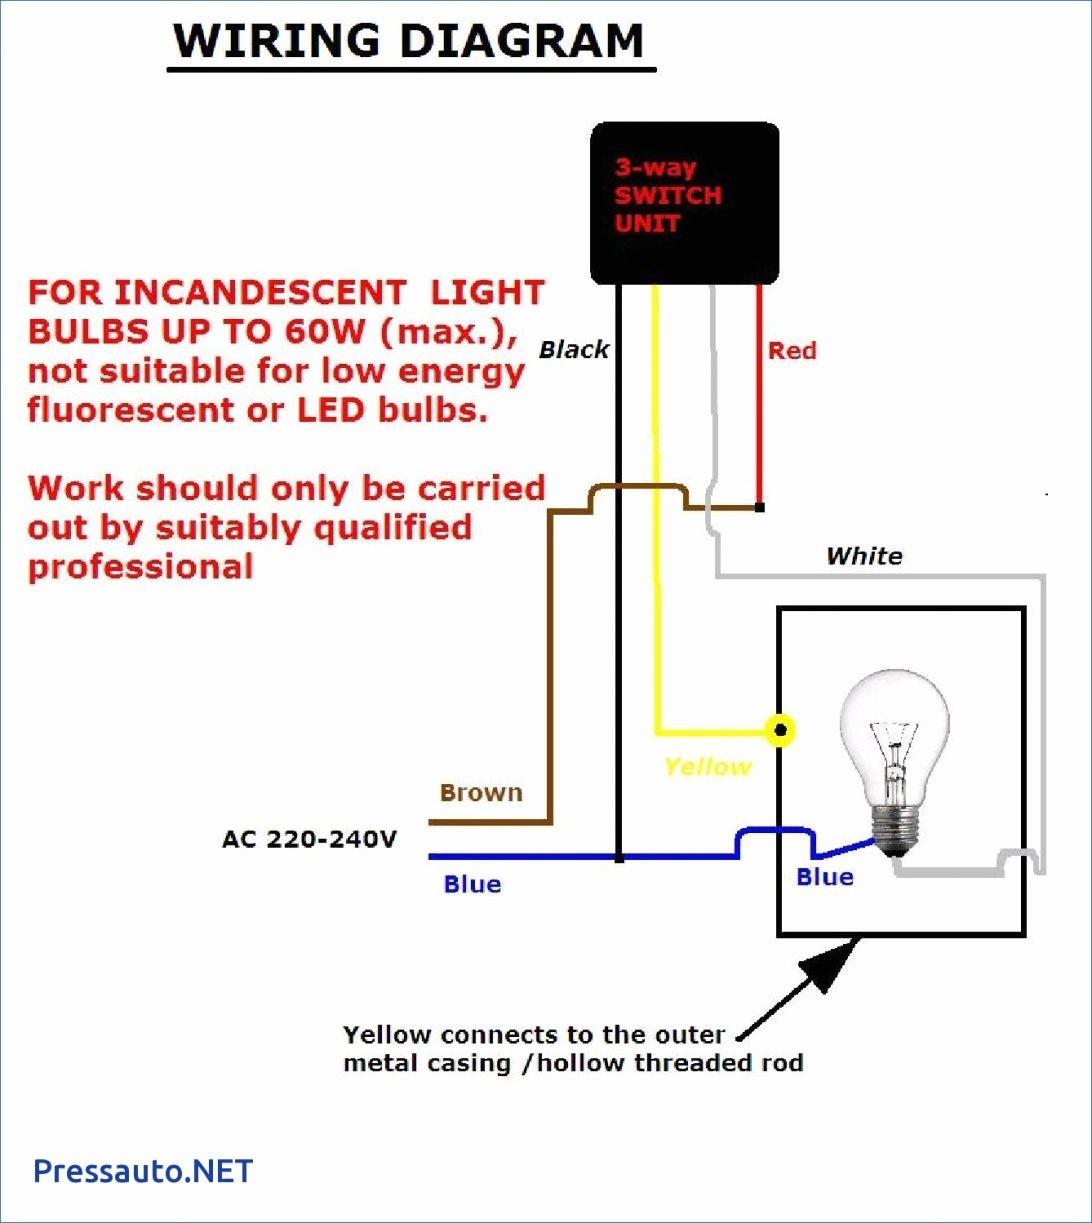 touch lamp sensor wiring diagram wiring diagram image rh mainetreasurechest com 3-Way Lamp Wiring Diagram Lamp Socket Wiring